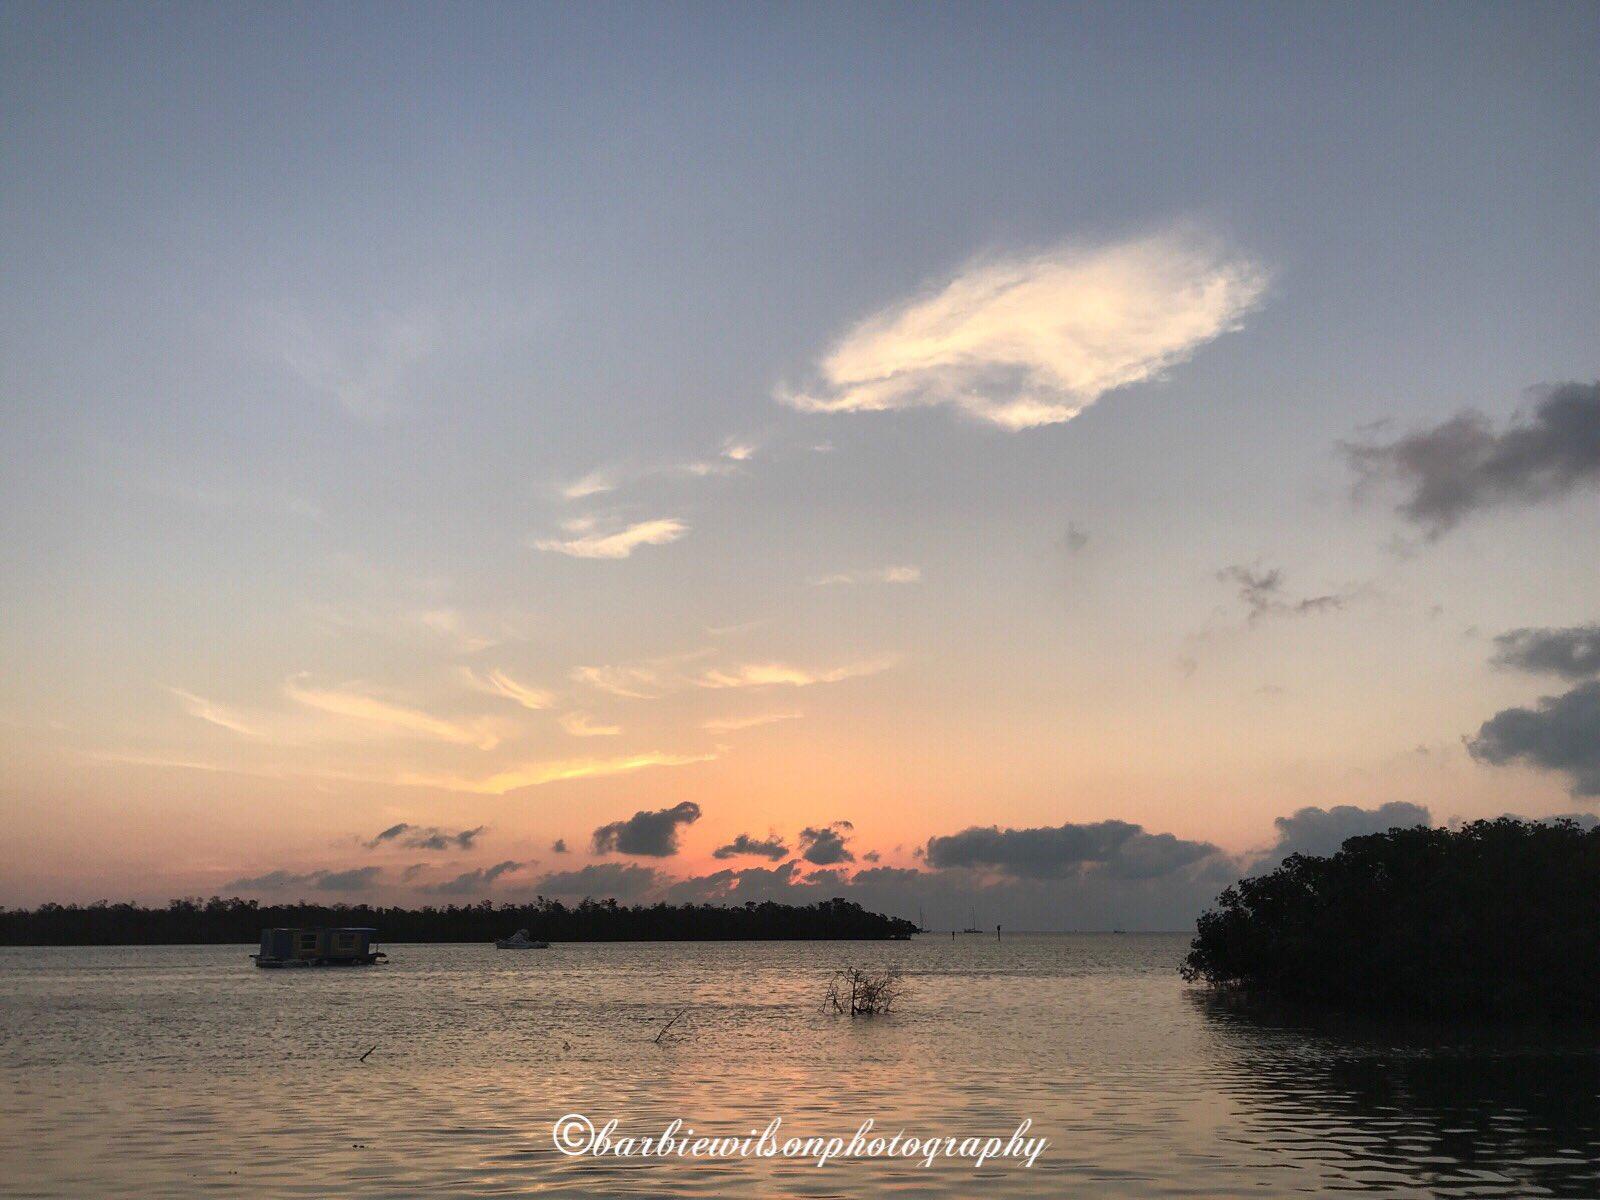 Pretty pastels start Monday off just right! Gm! #keywest #sunrise https://t.co/ADq39LyILy